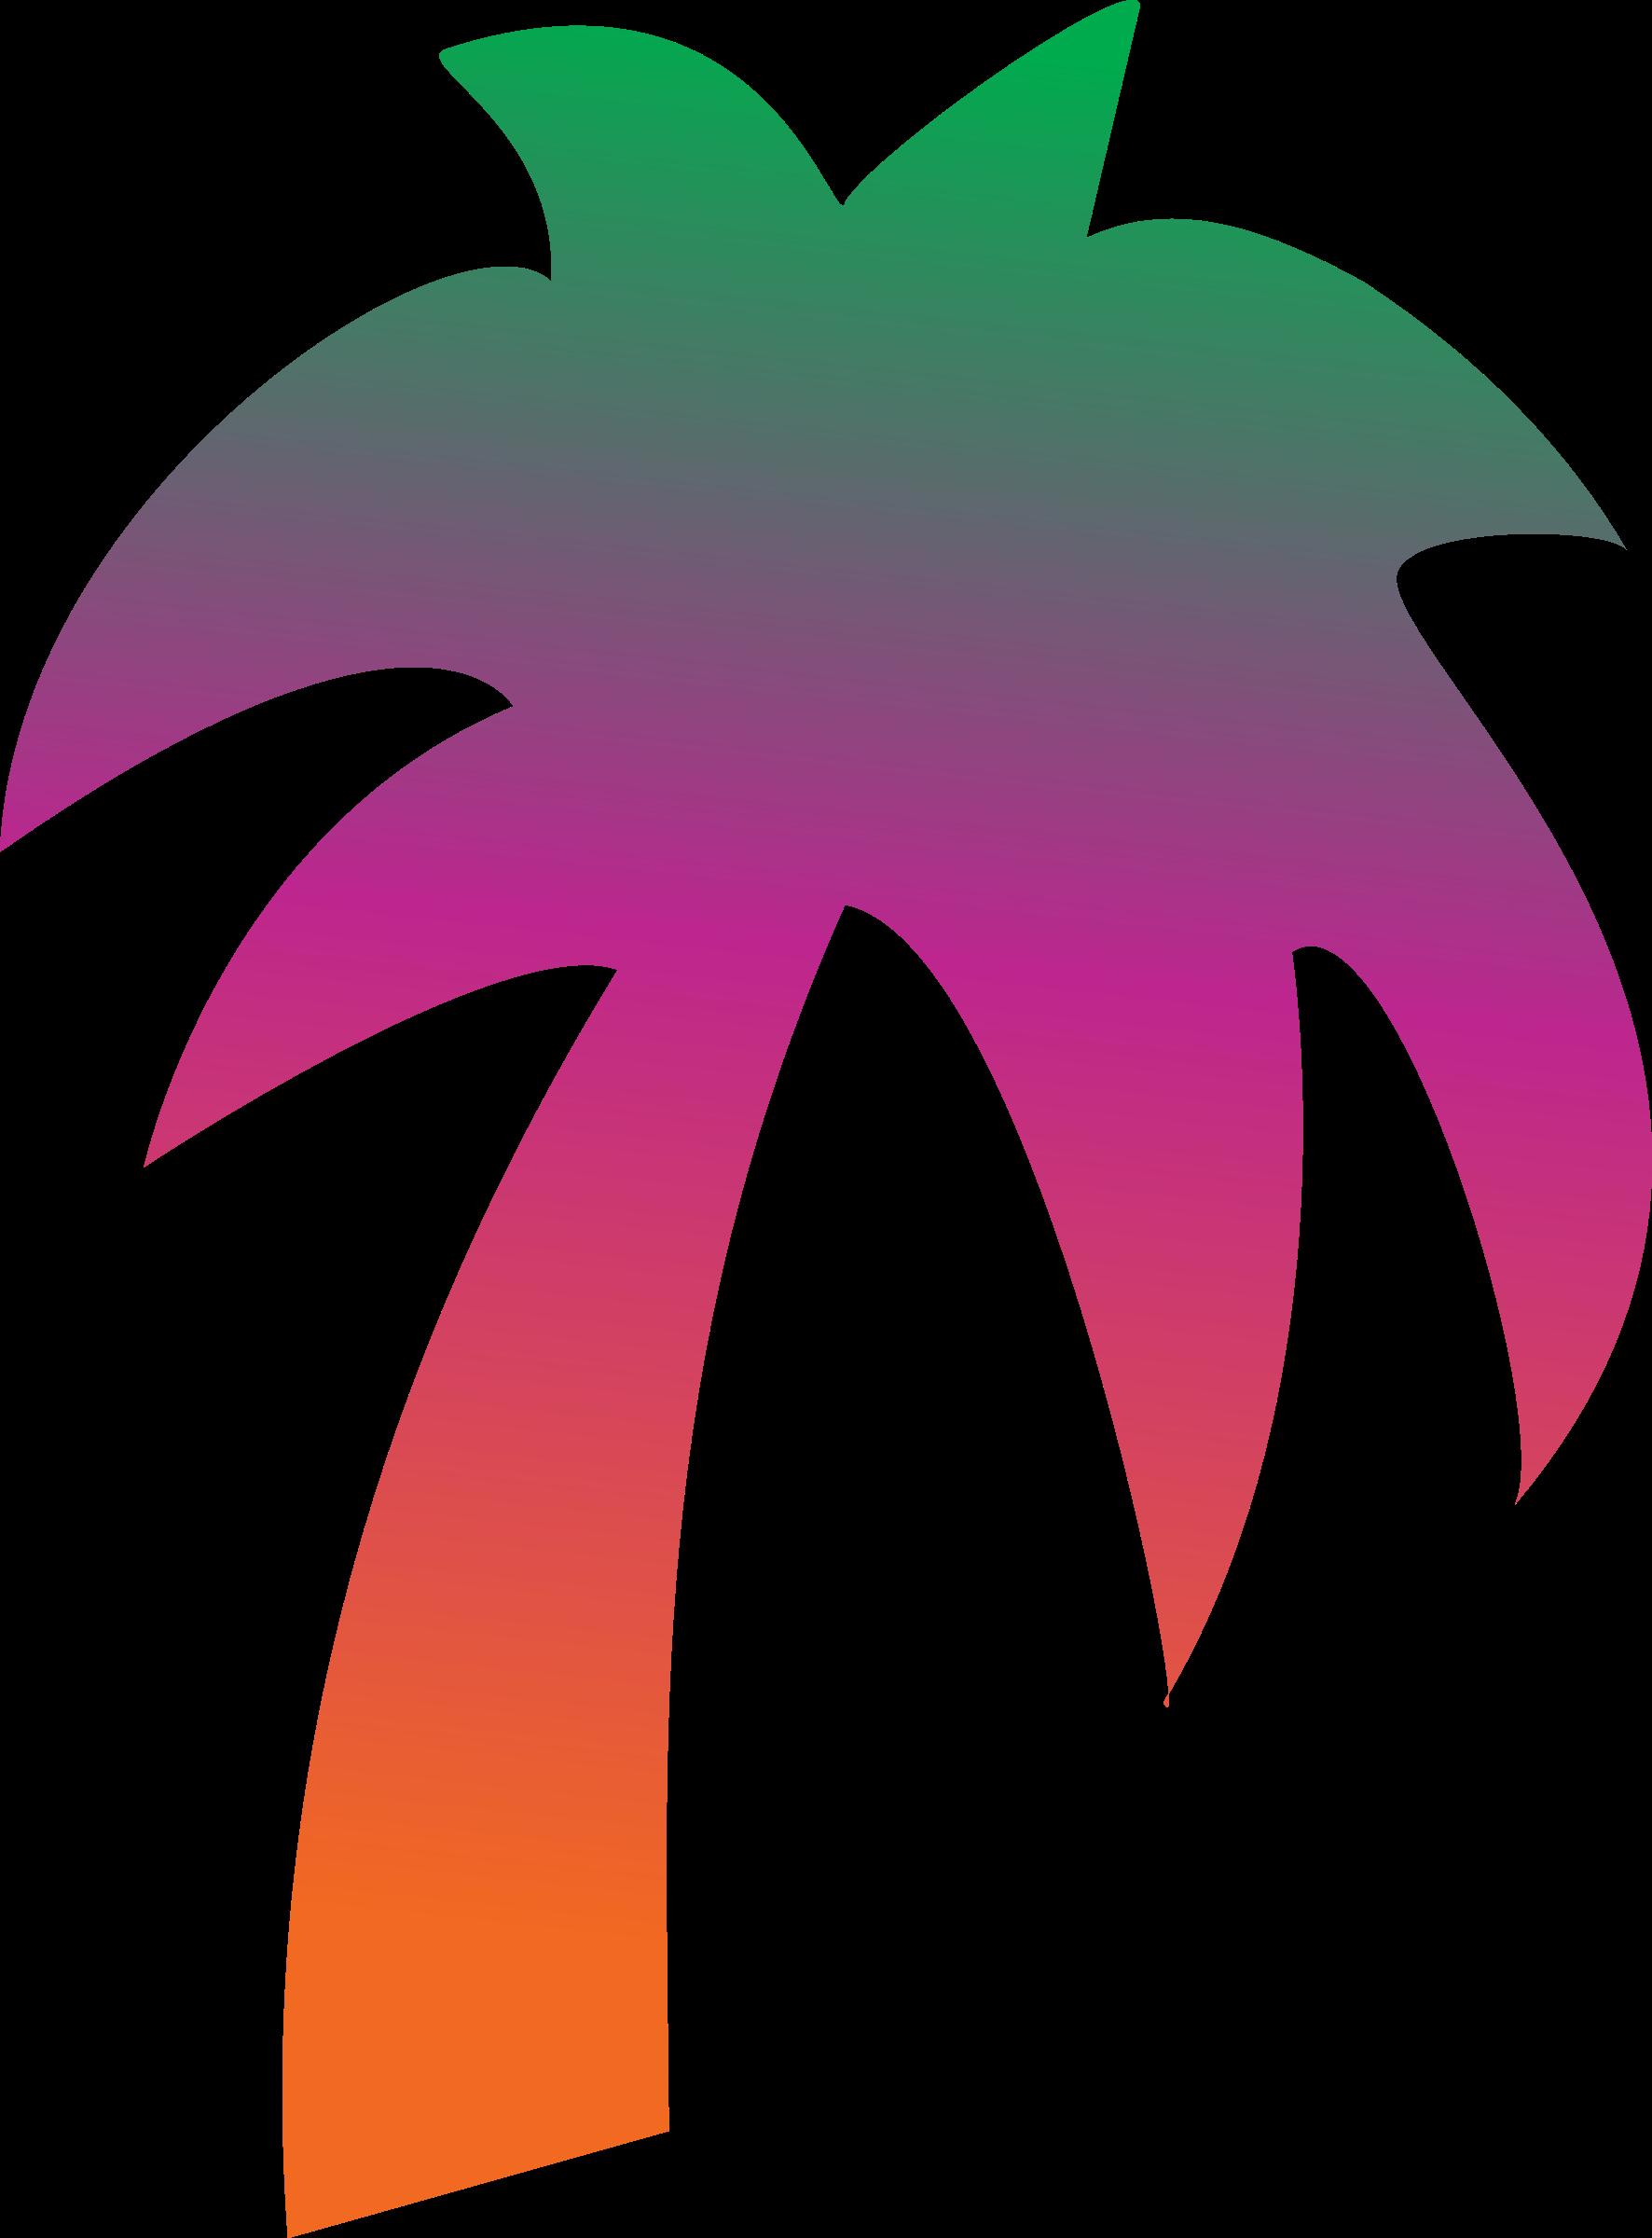 Rainbow tree clipart vector transparent library Clipart - Rainbow palm tree vector transparent library